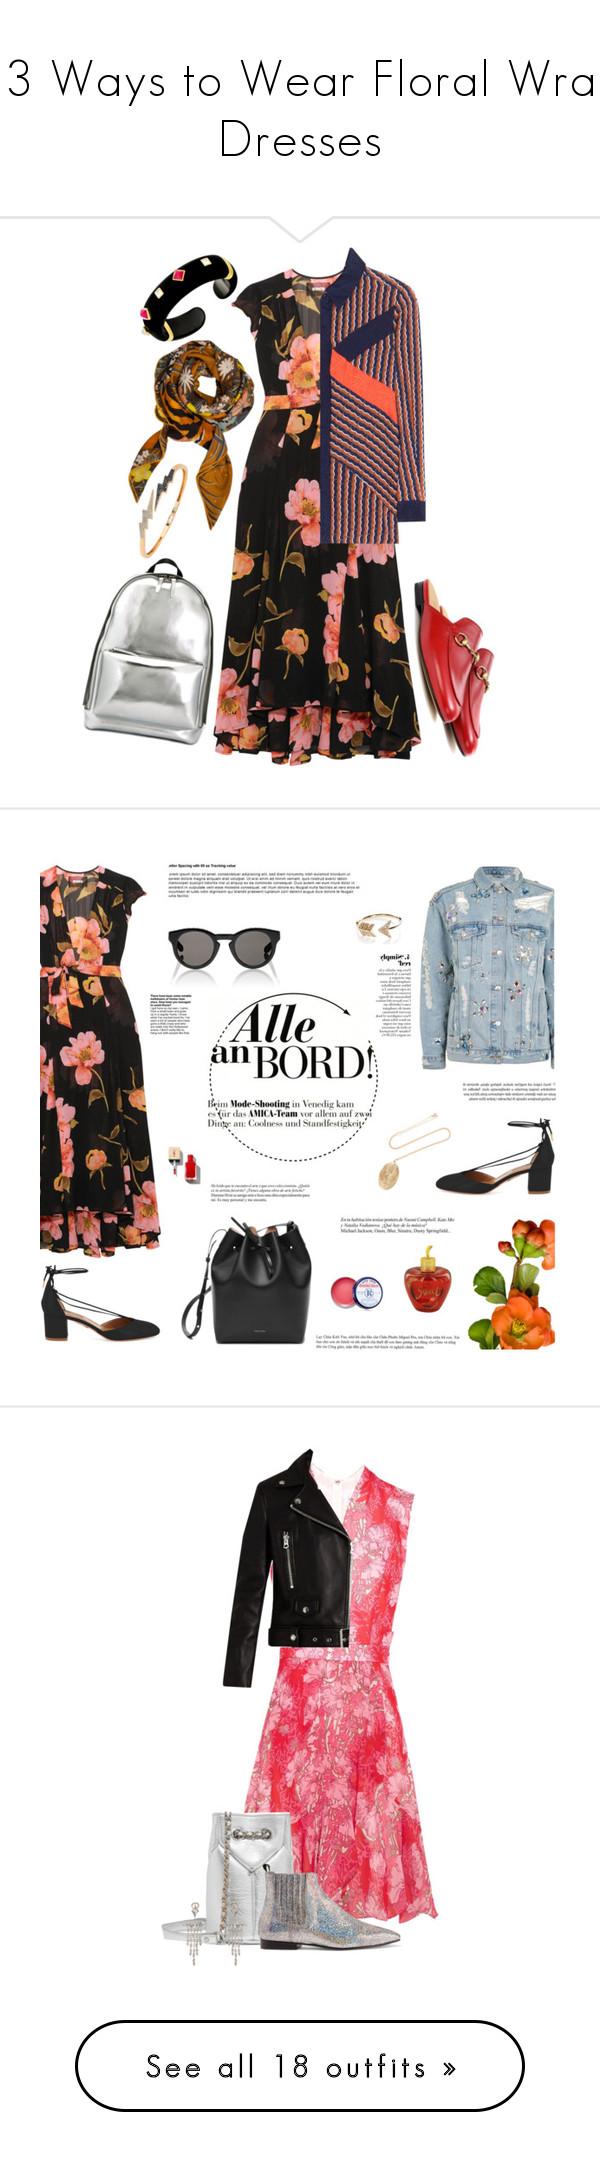 """13 Ways to Wear Floral Wrap Dresses"" by polyvore-editorial ❤ liked on Polyvore featuring waystowear, floralwrapdresses, Reformation, Margot McKinney, Gucci, 3.1 Phillip Lim, Diane Von Furstenberg, Hermès, Bee Goddess and Topshop"